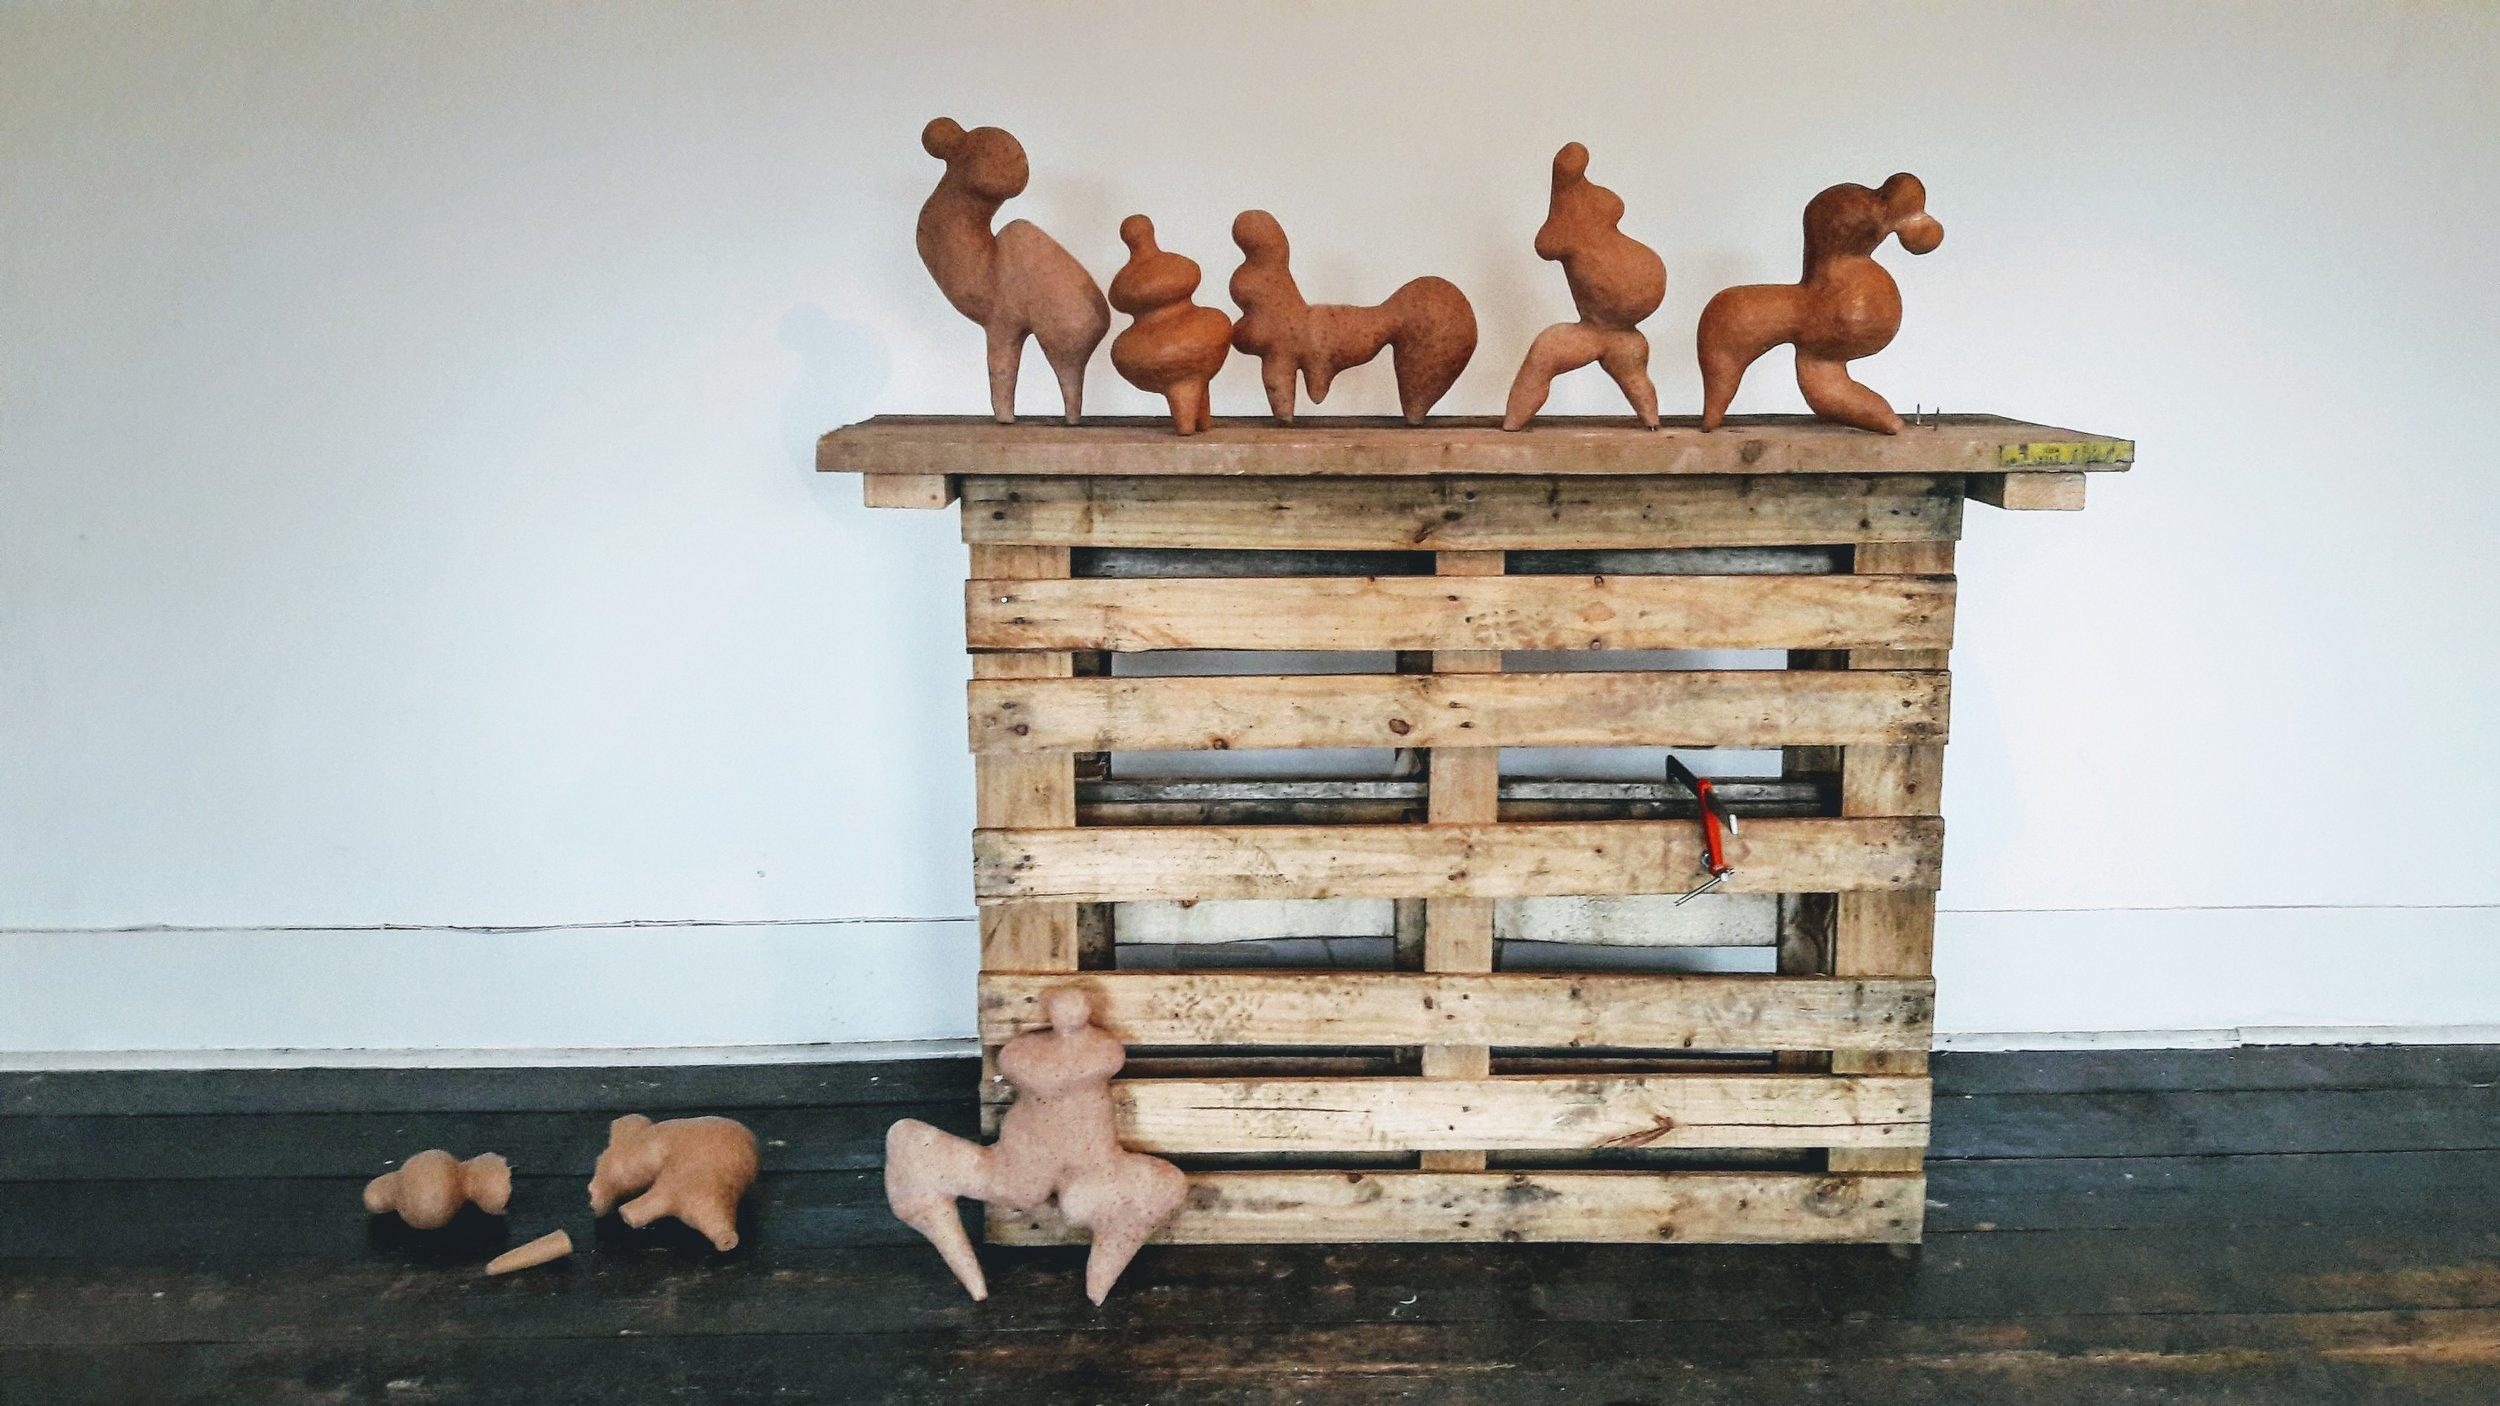 The Herd (installation shot)